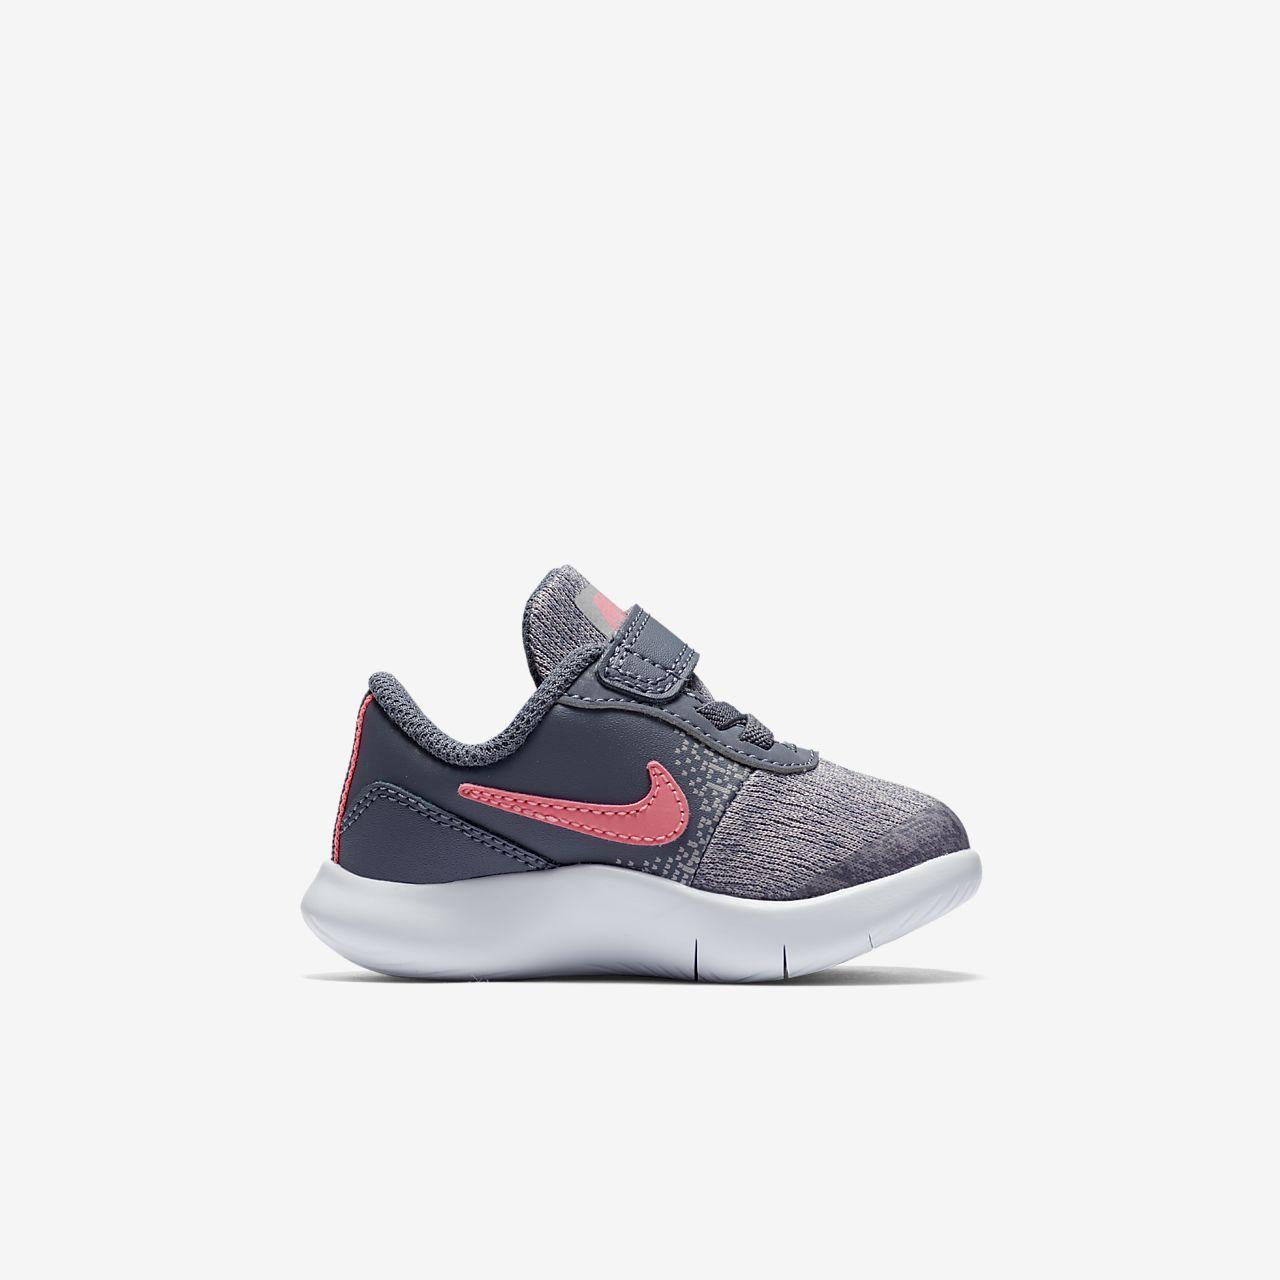 ... Nike Flex Contact Baby & Toddler Shoe